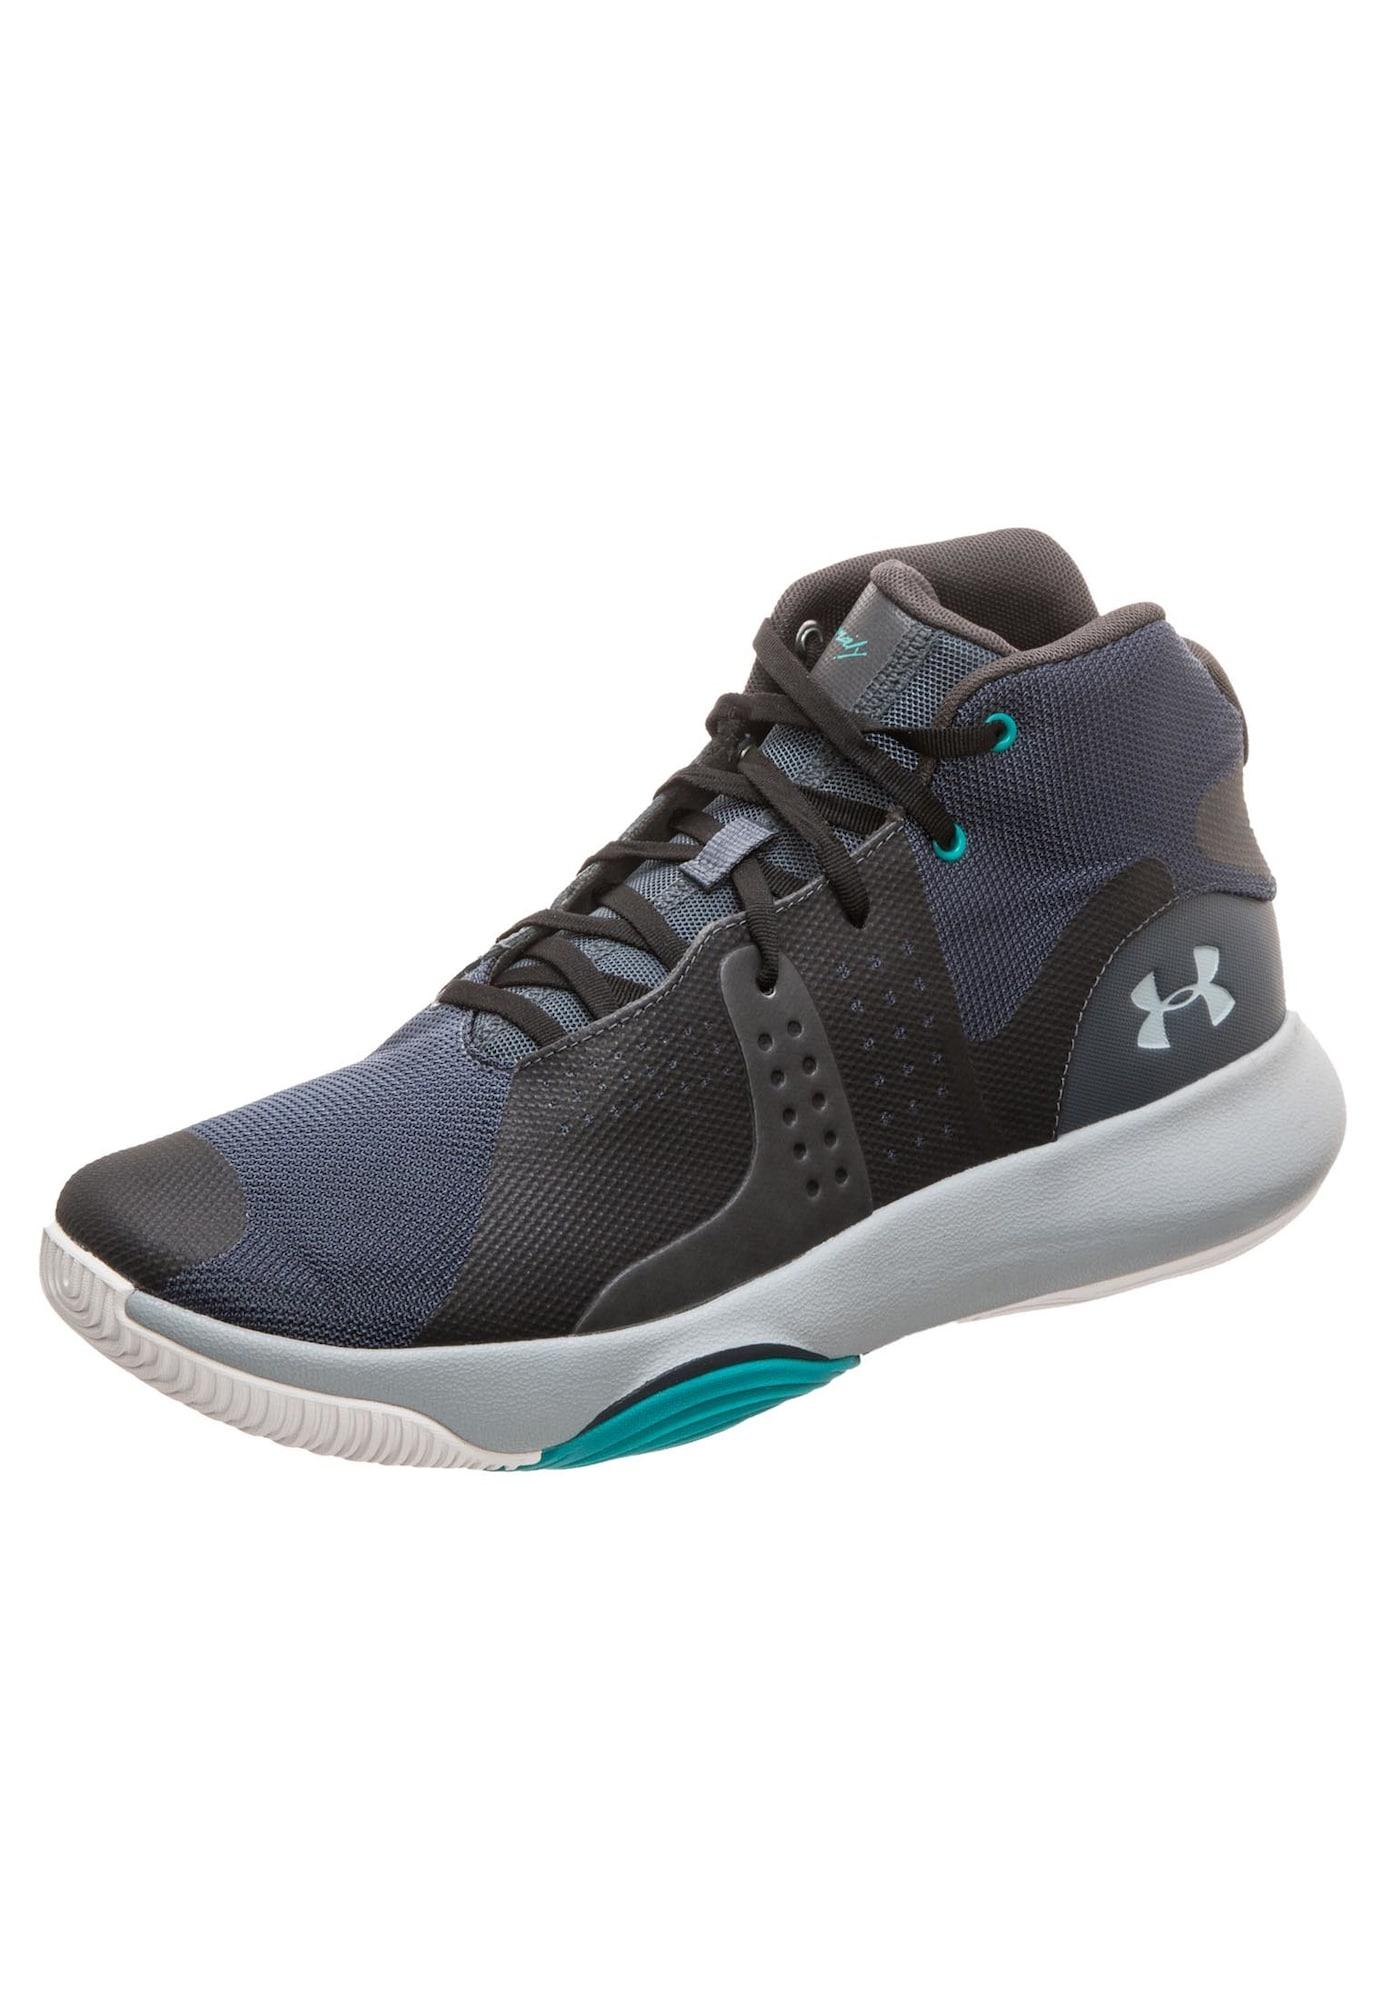 Basketballschuh 'Anomaly' | Schuhe > Sportschuhe > Basketballschuhe | Under Armour